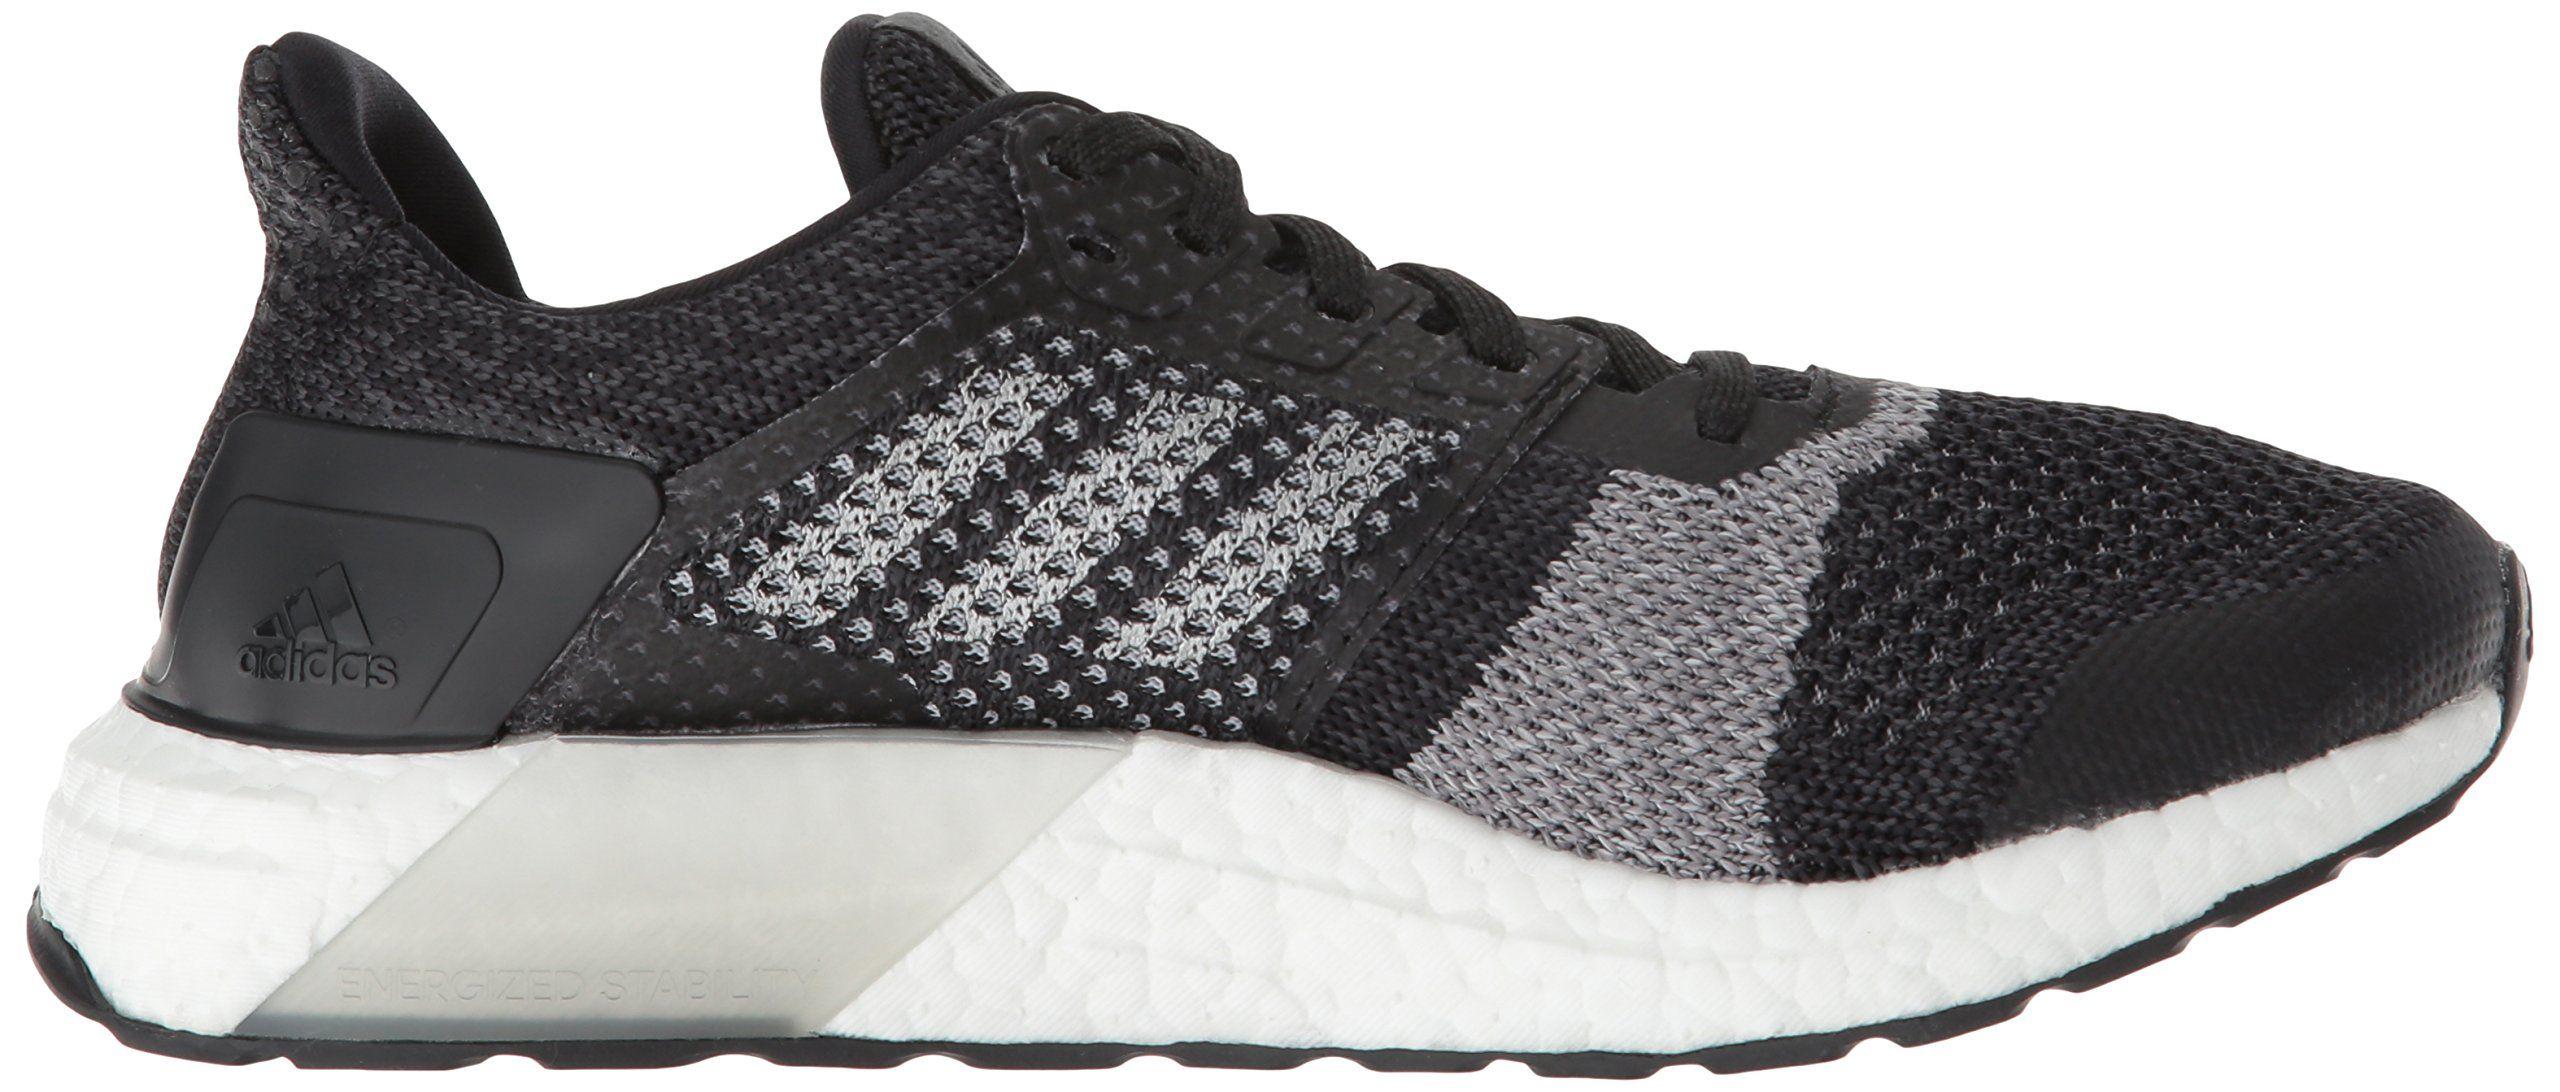 watch 1cf65 91e19 adidas Womens Ultraboost ST Running Shoe Black Silver Metallic Carbon 9.5 M  US -